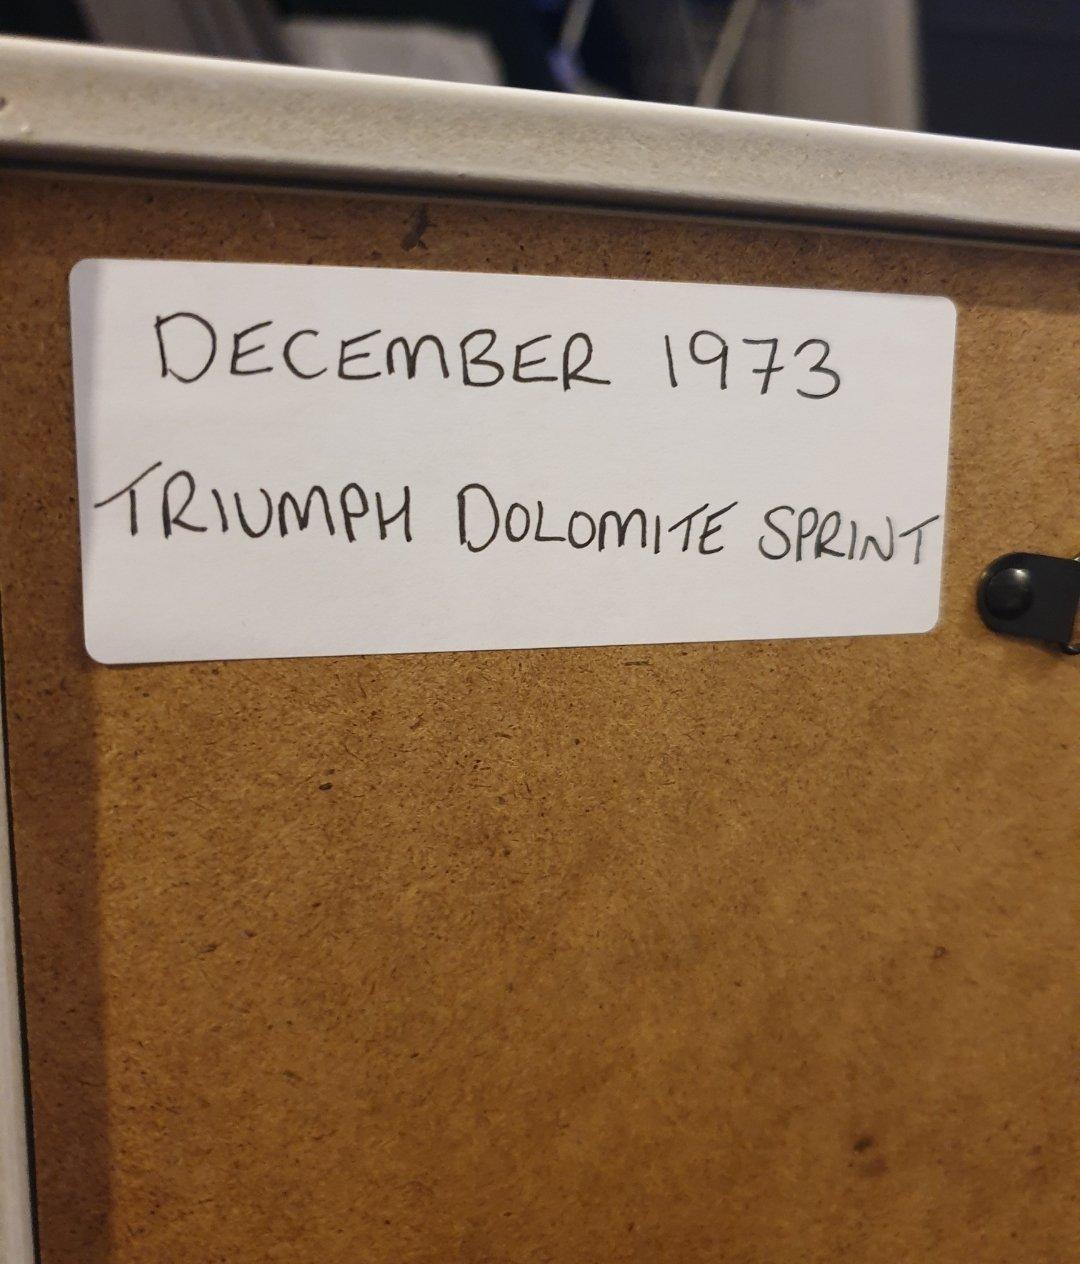 1973 Original Triumph Dolomite Sprint Advert For Sale (picture 2 of 2)